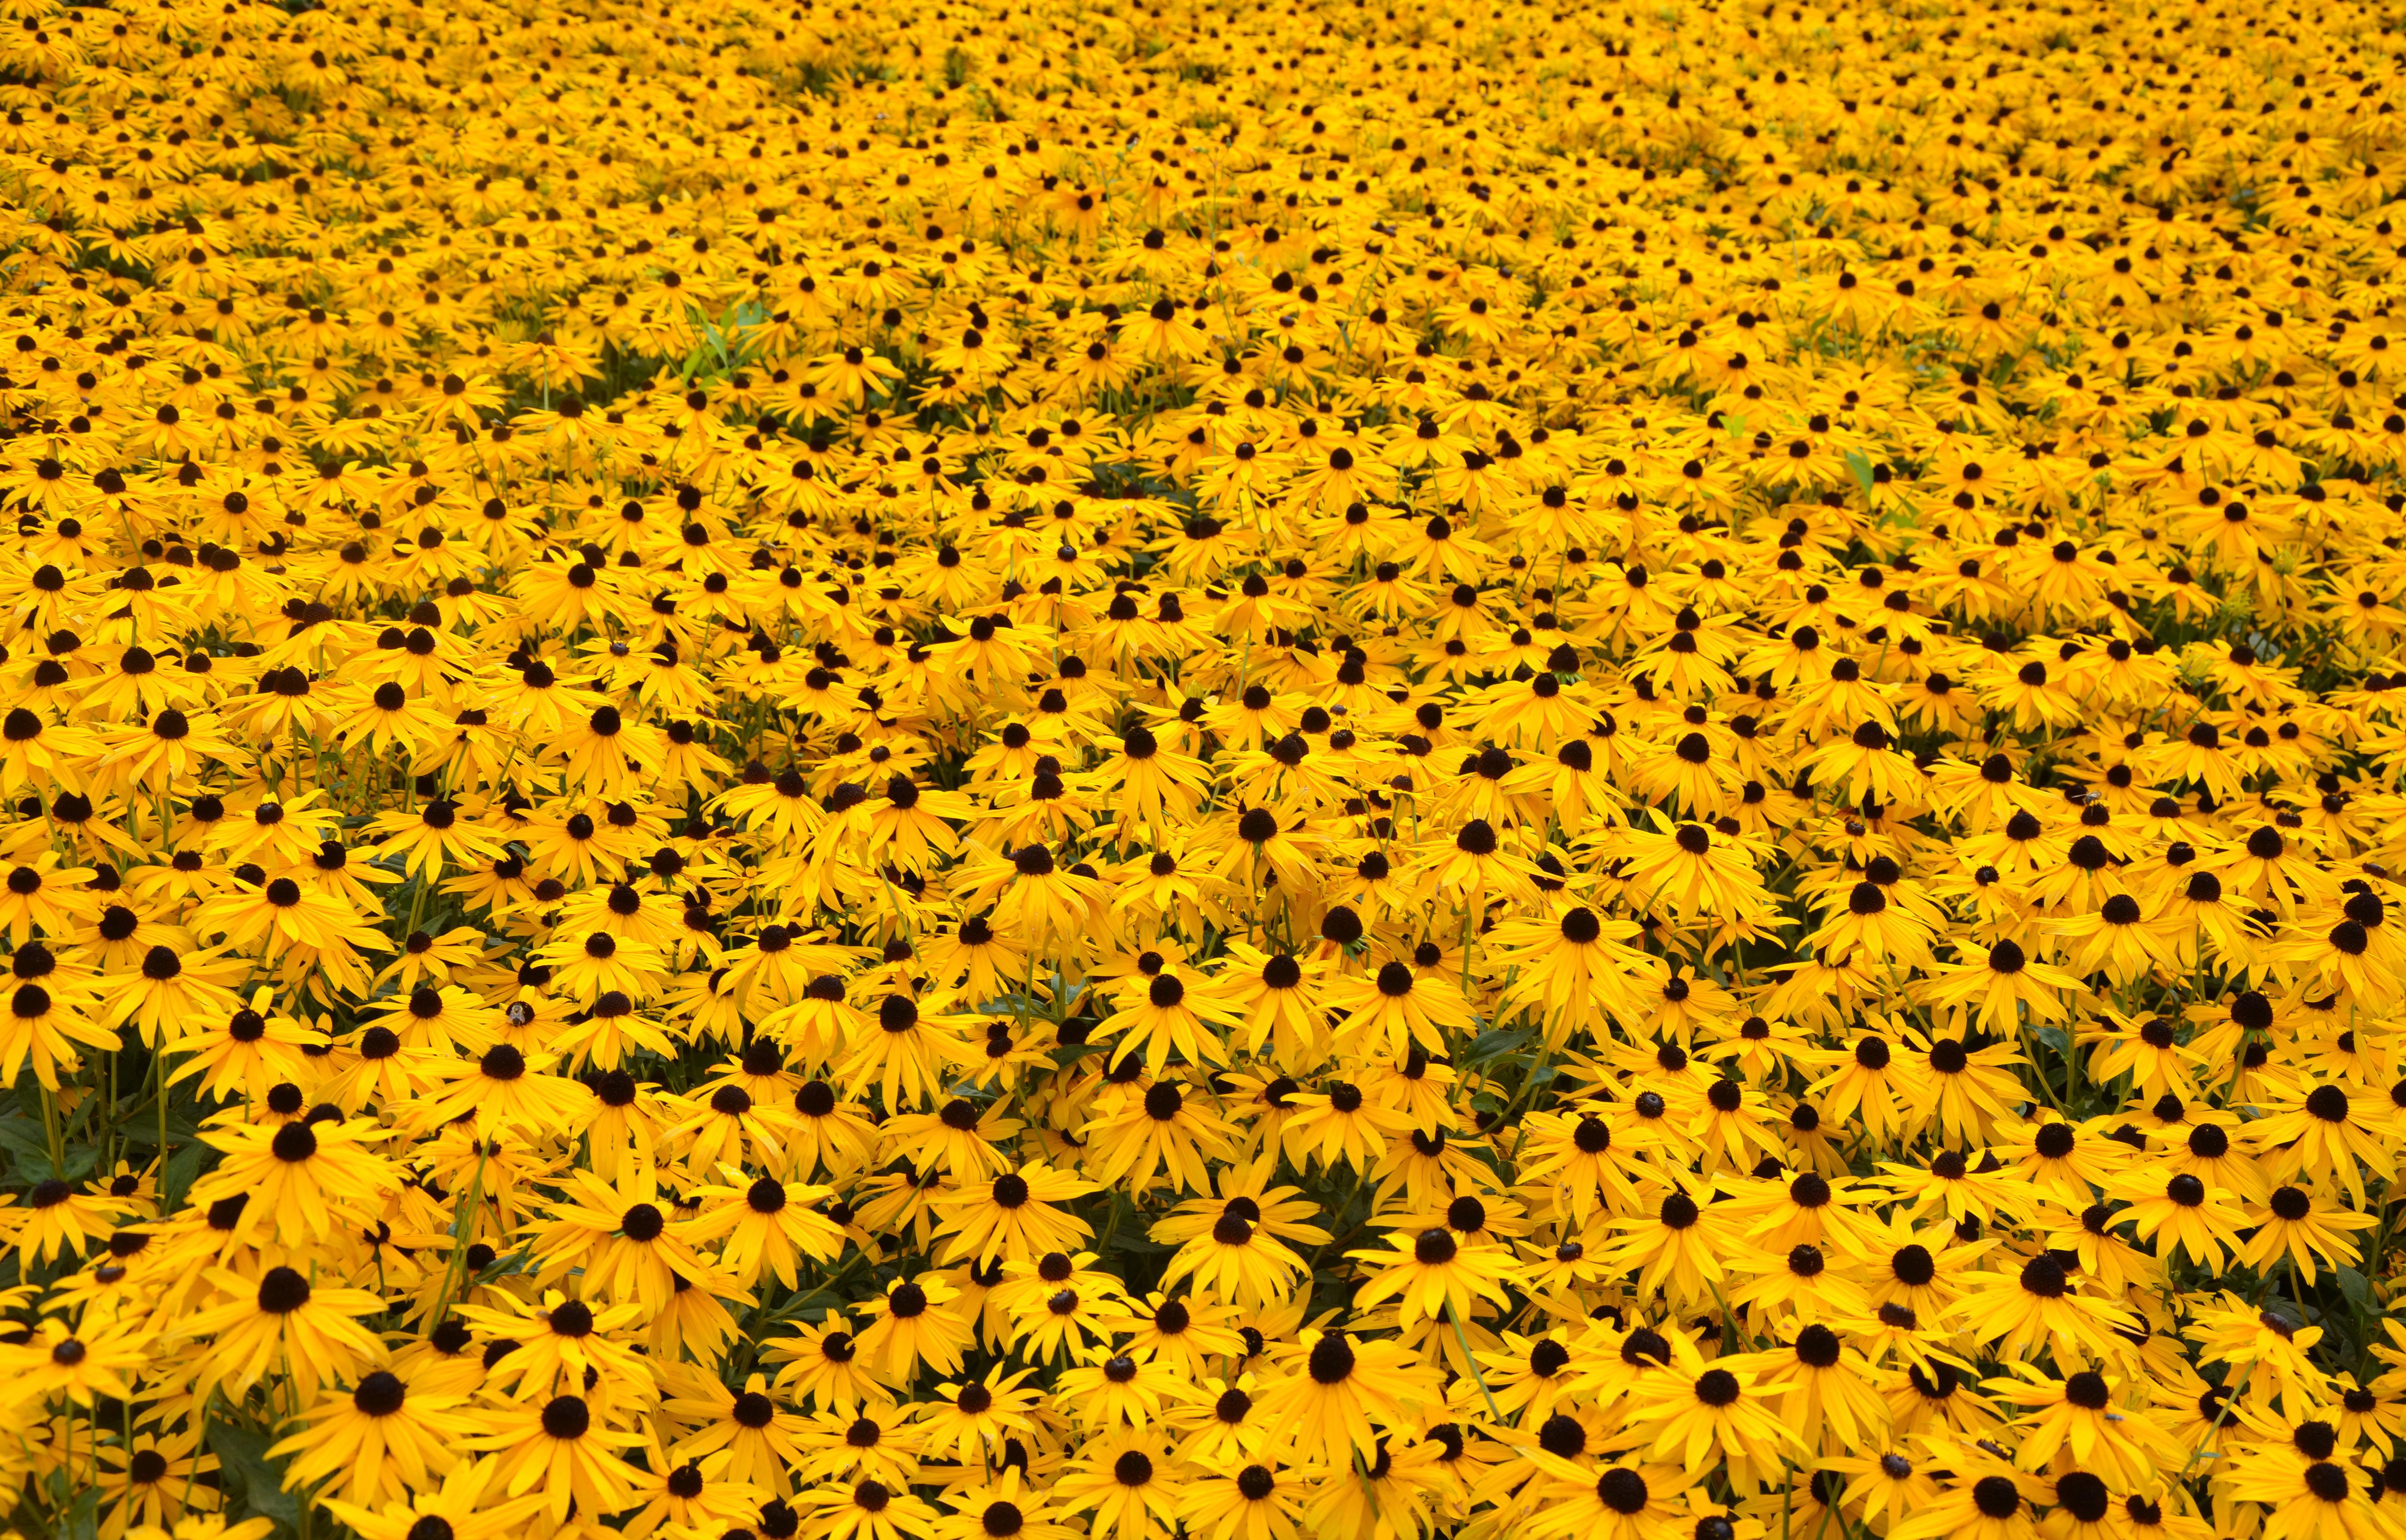 Filefield of yellow flowers 6080049195g wikimedia commons filefield of yellow flowers 6080049195g mightylinksfo Choice Image